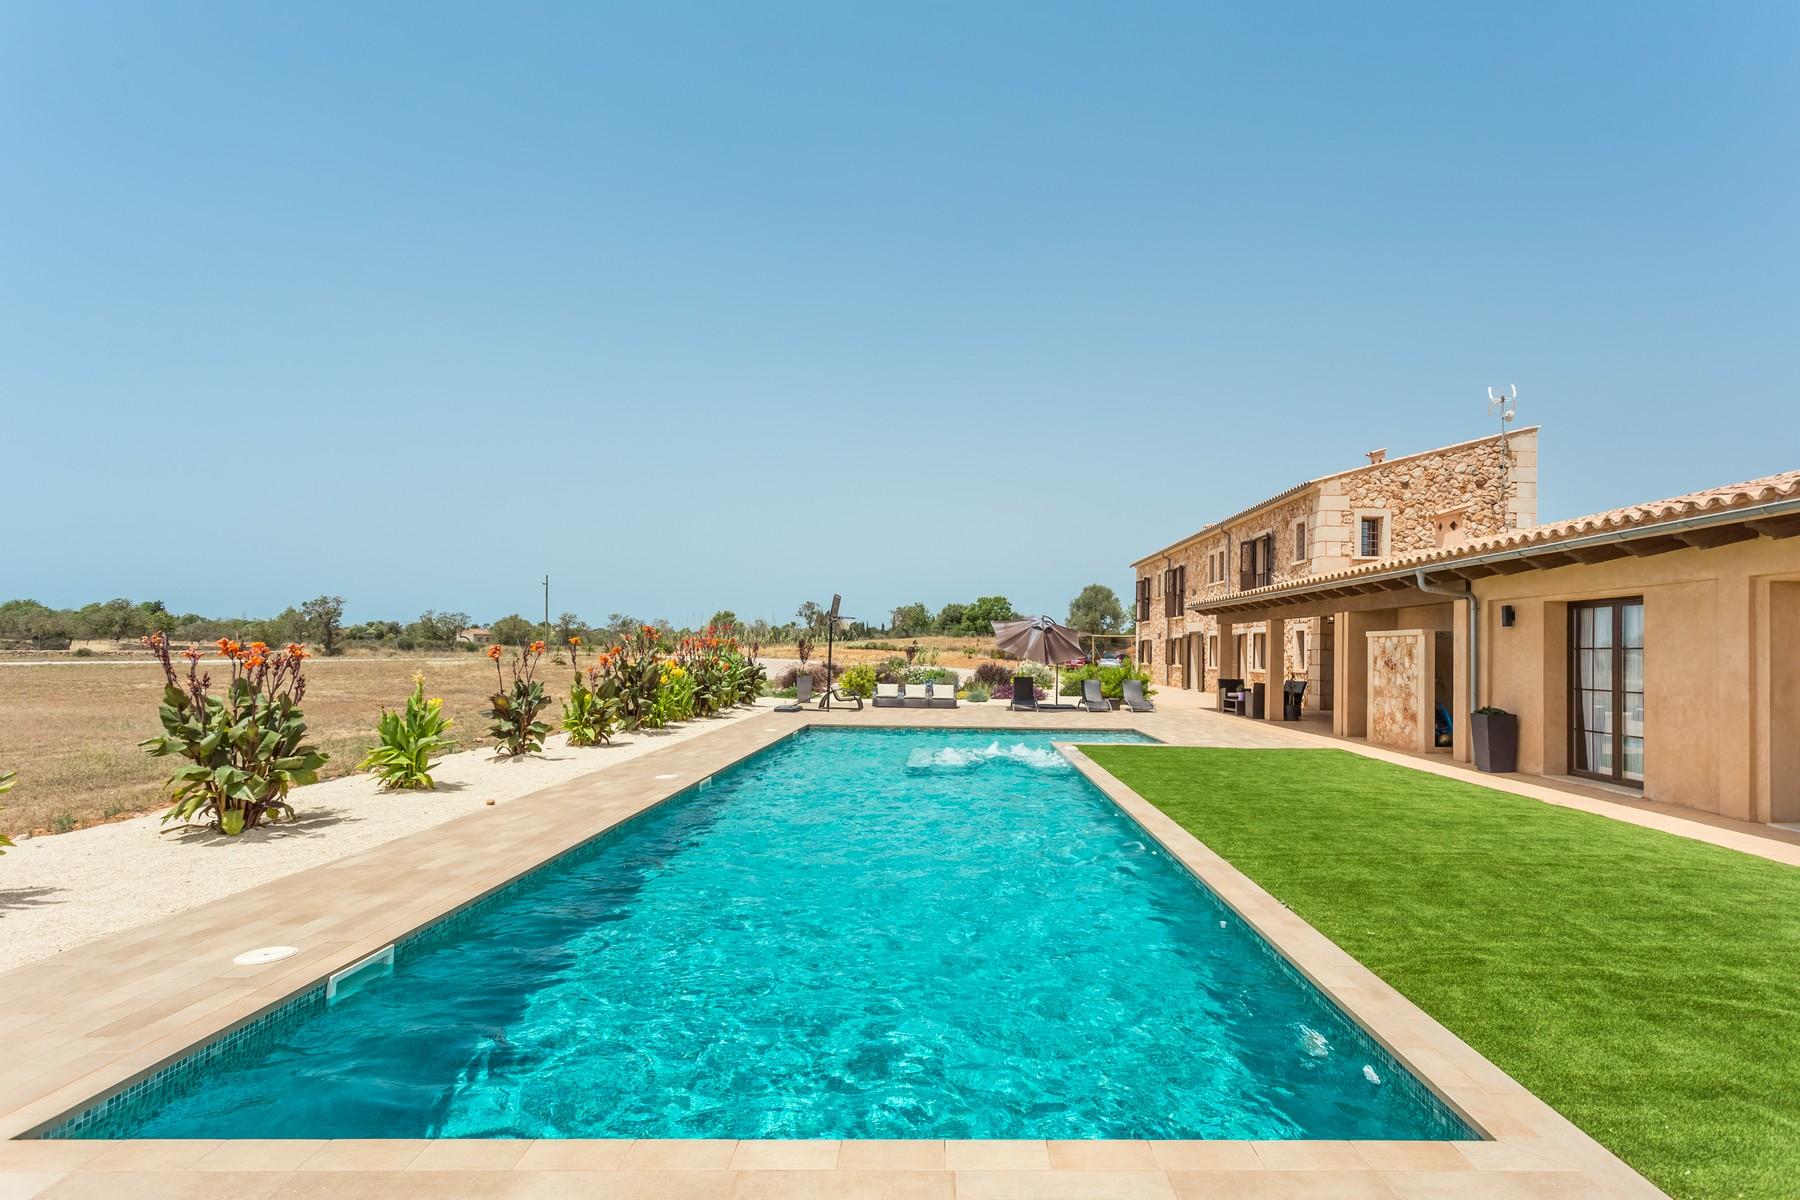 独户住宅 为 销售 在 Country Estate with panoramic views in Llucmajor 巴利阿里群岛其他地方, 巴利阿里群岛, 07000 西班牙